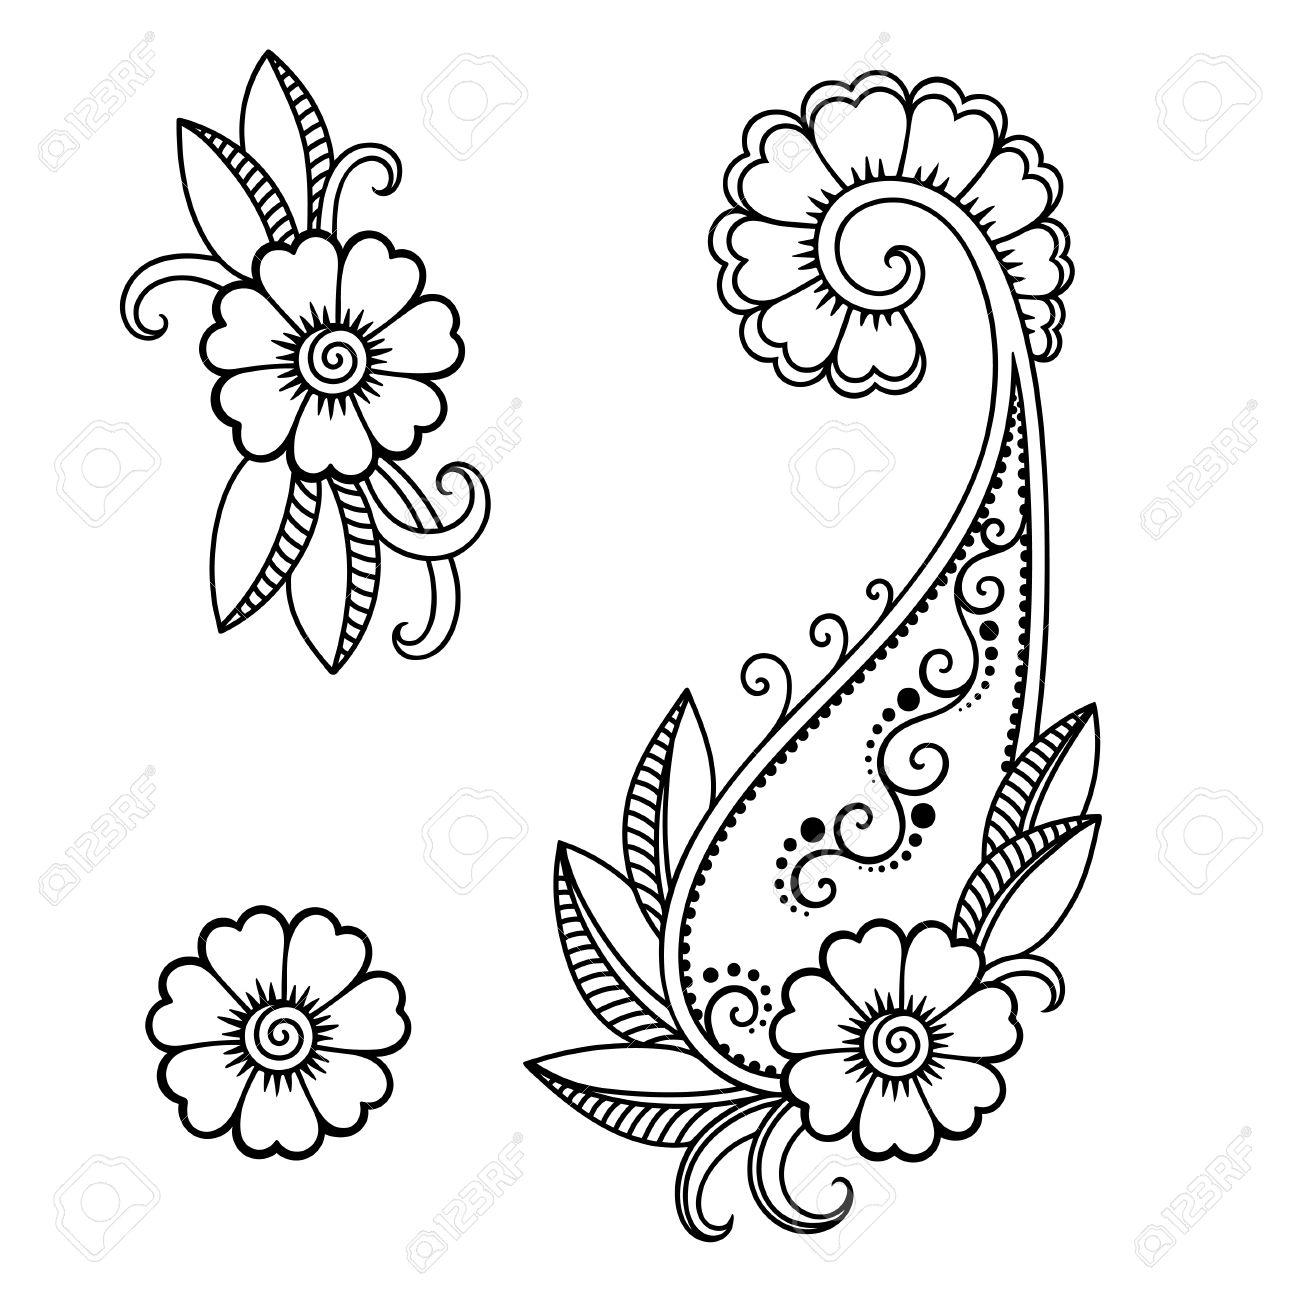 Flower Template Eliolera – Flower Template